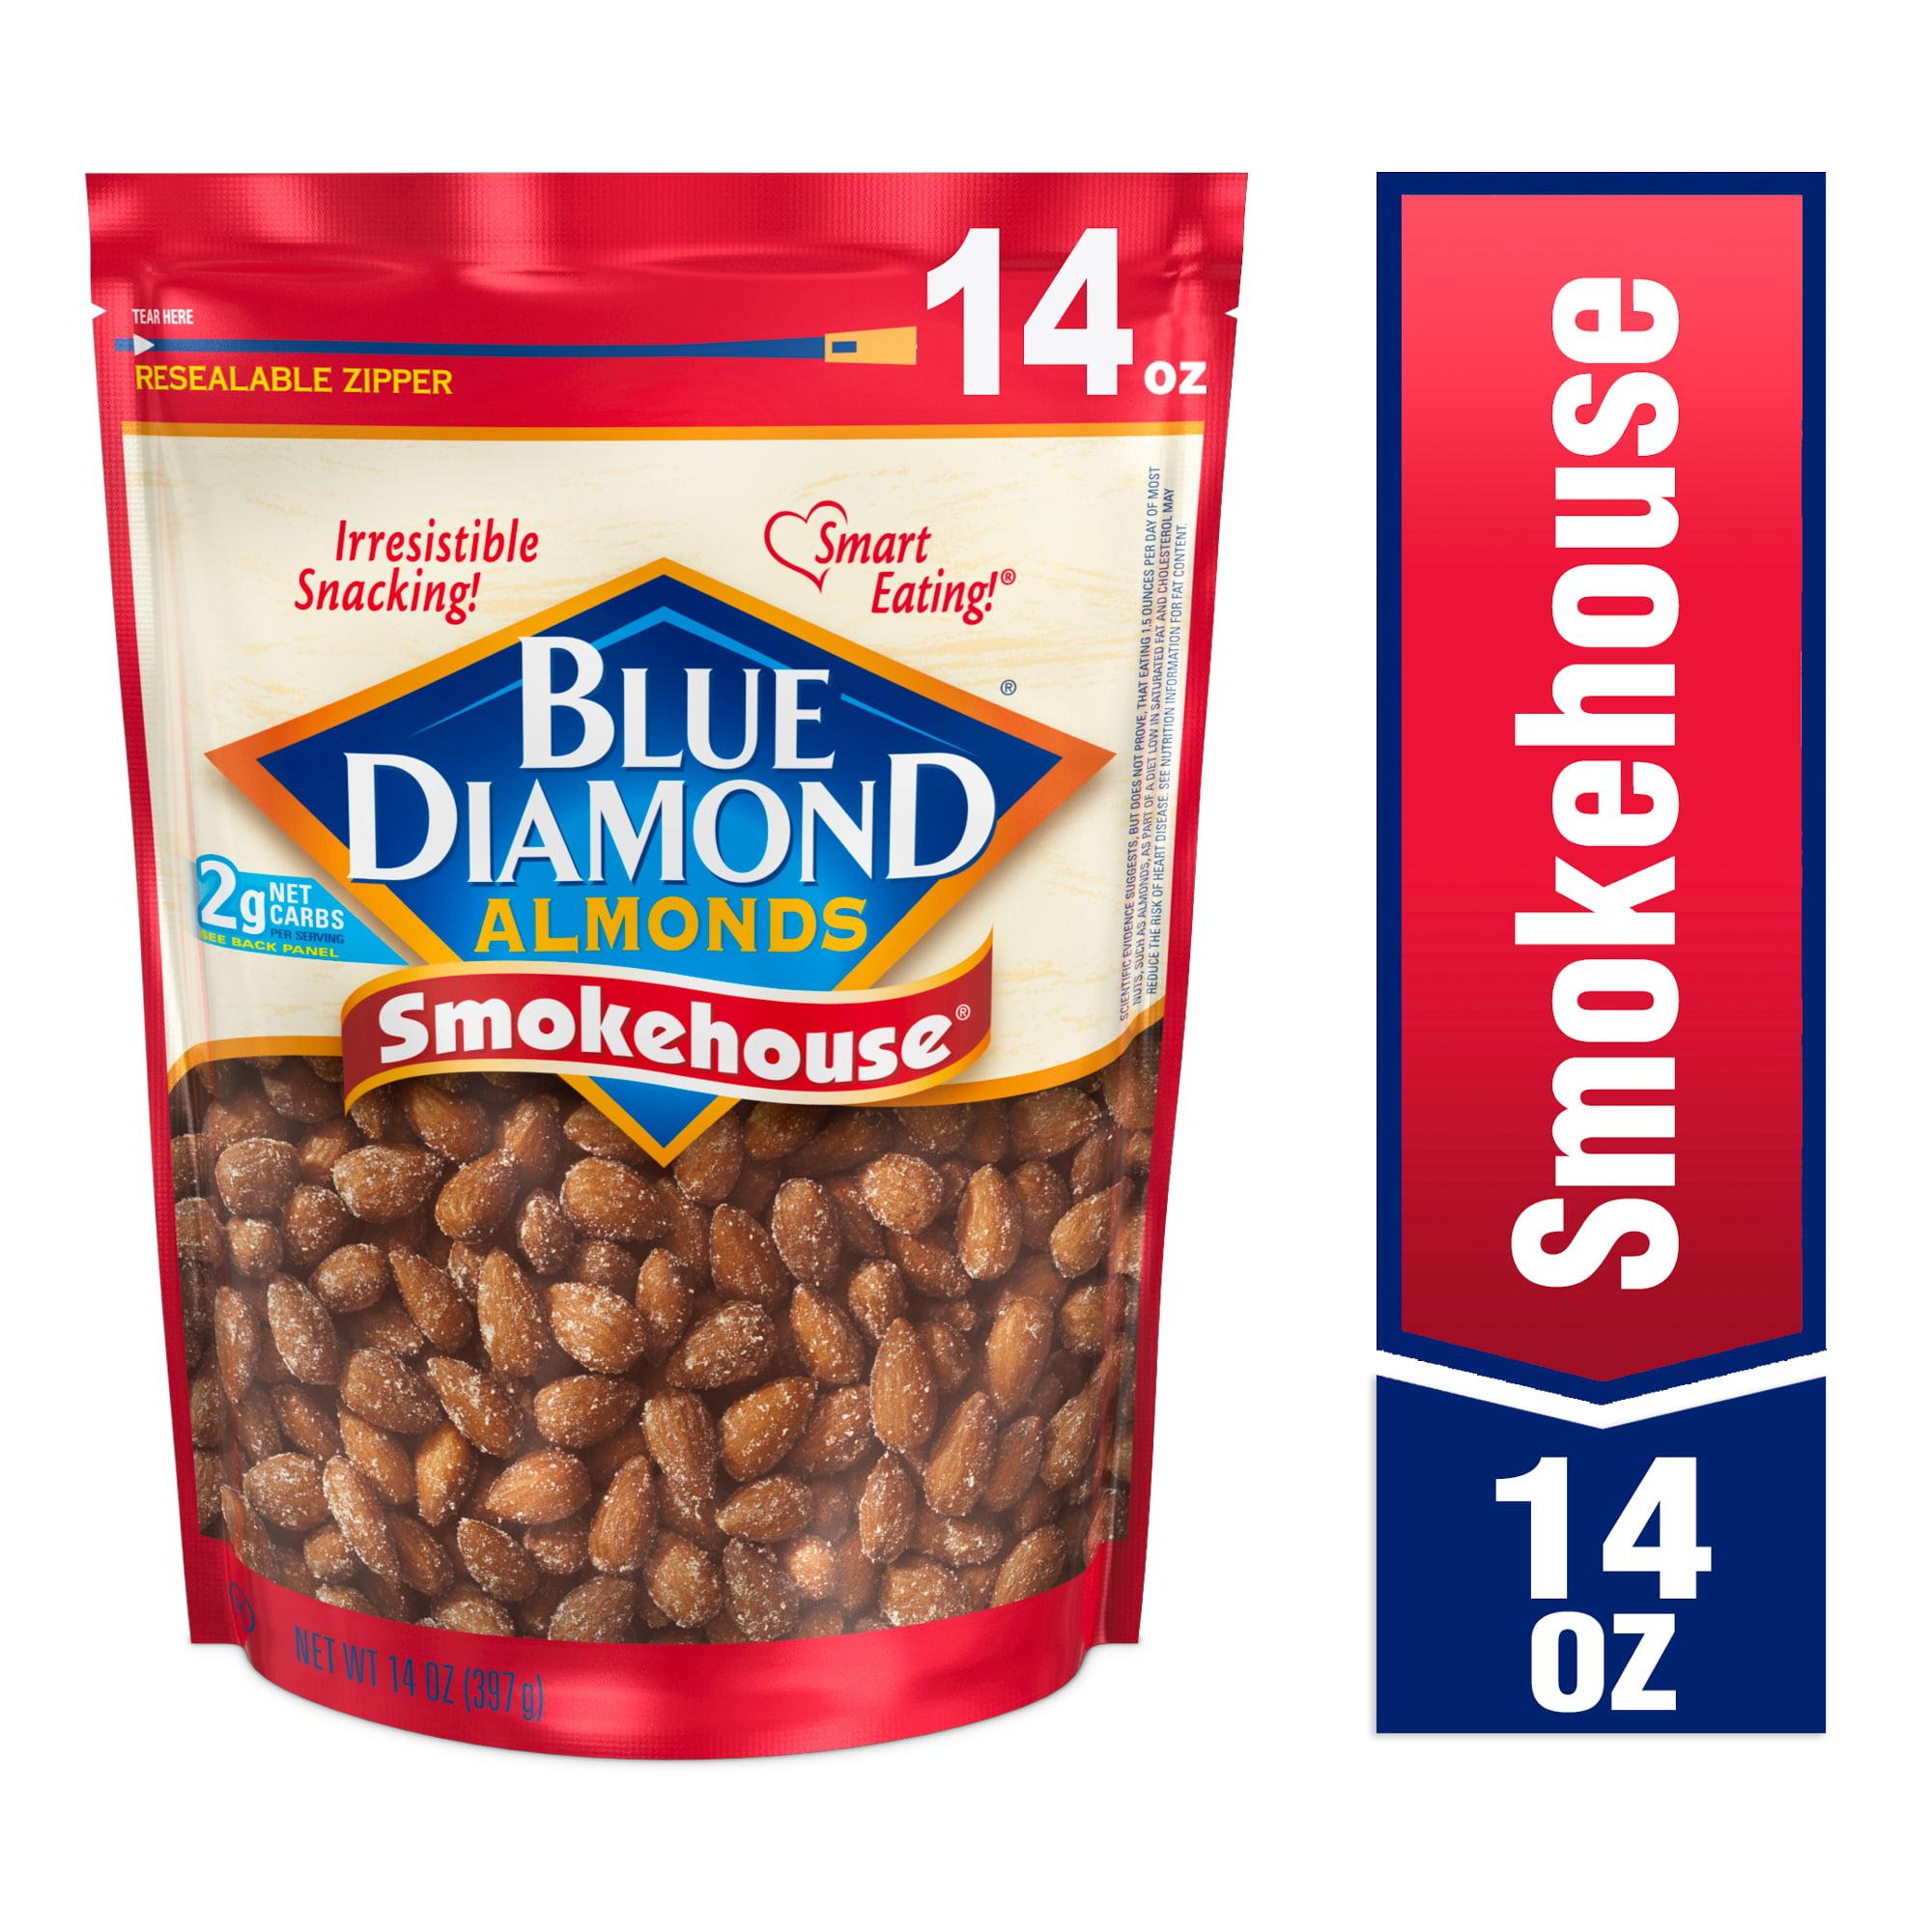 Blue Diamond Almonds, Smokehouse 14 oz